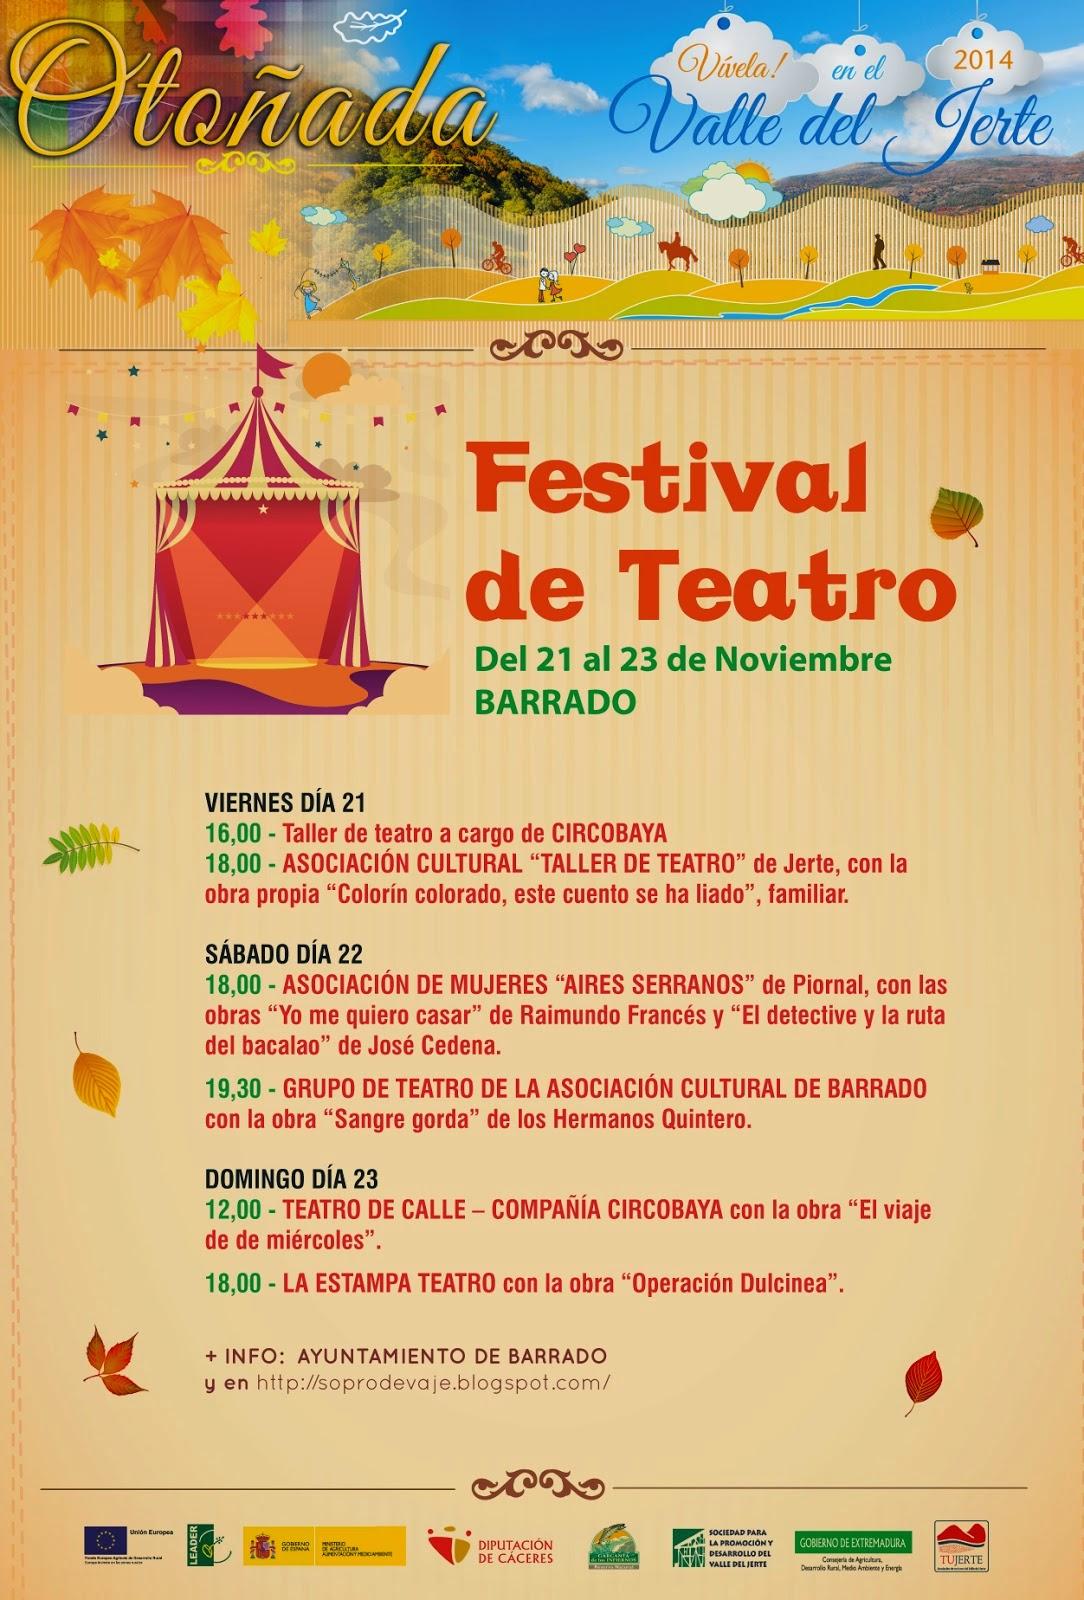 FESTIVAL DE TEATRO (Barrado)